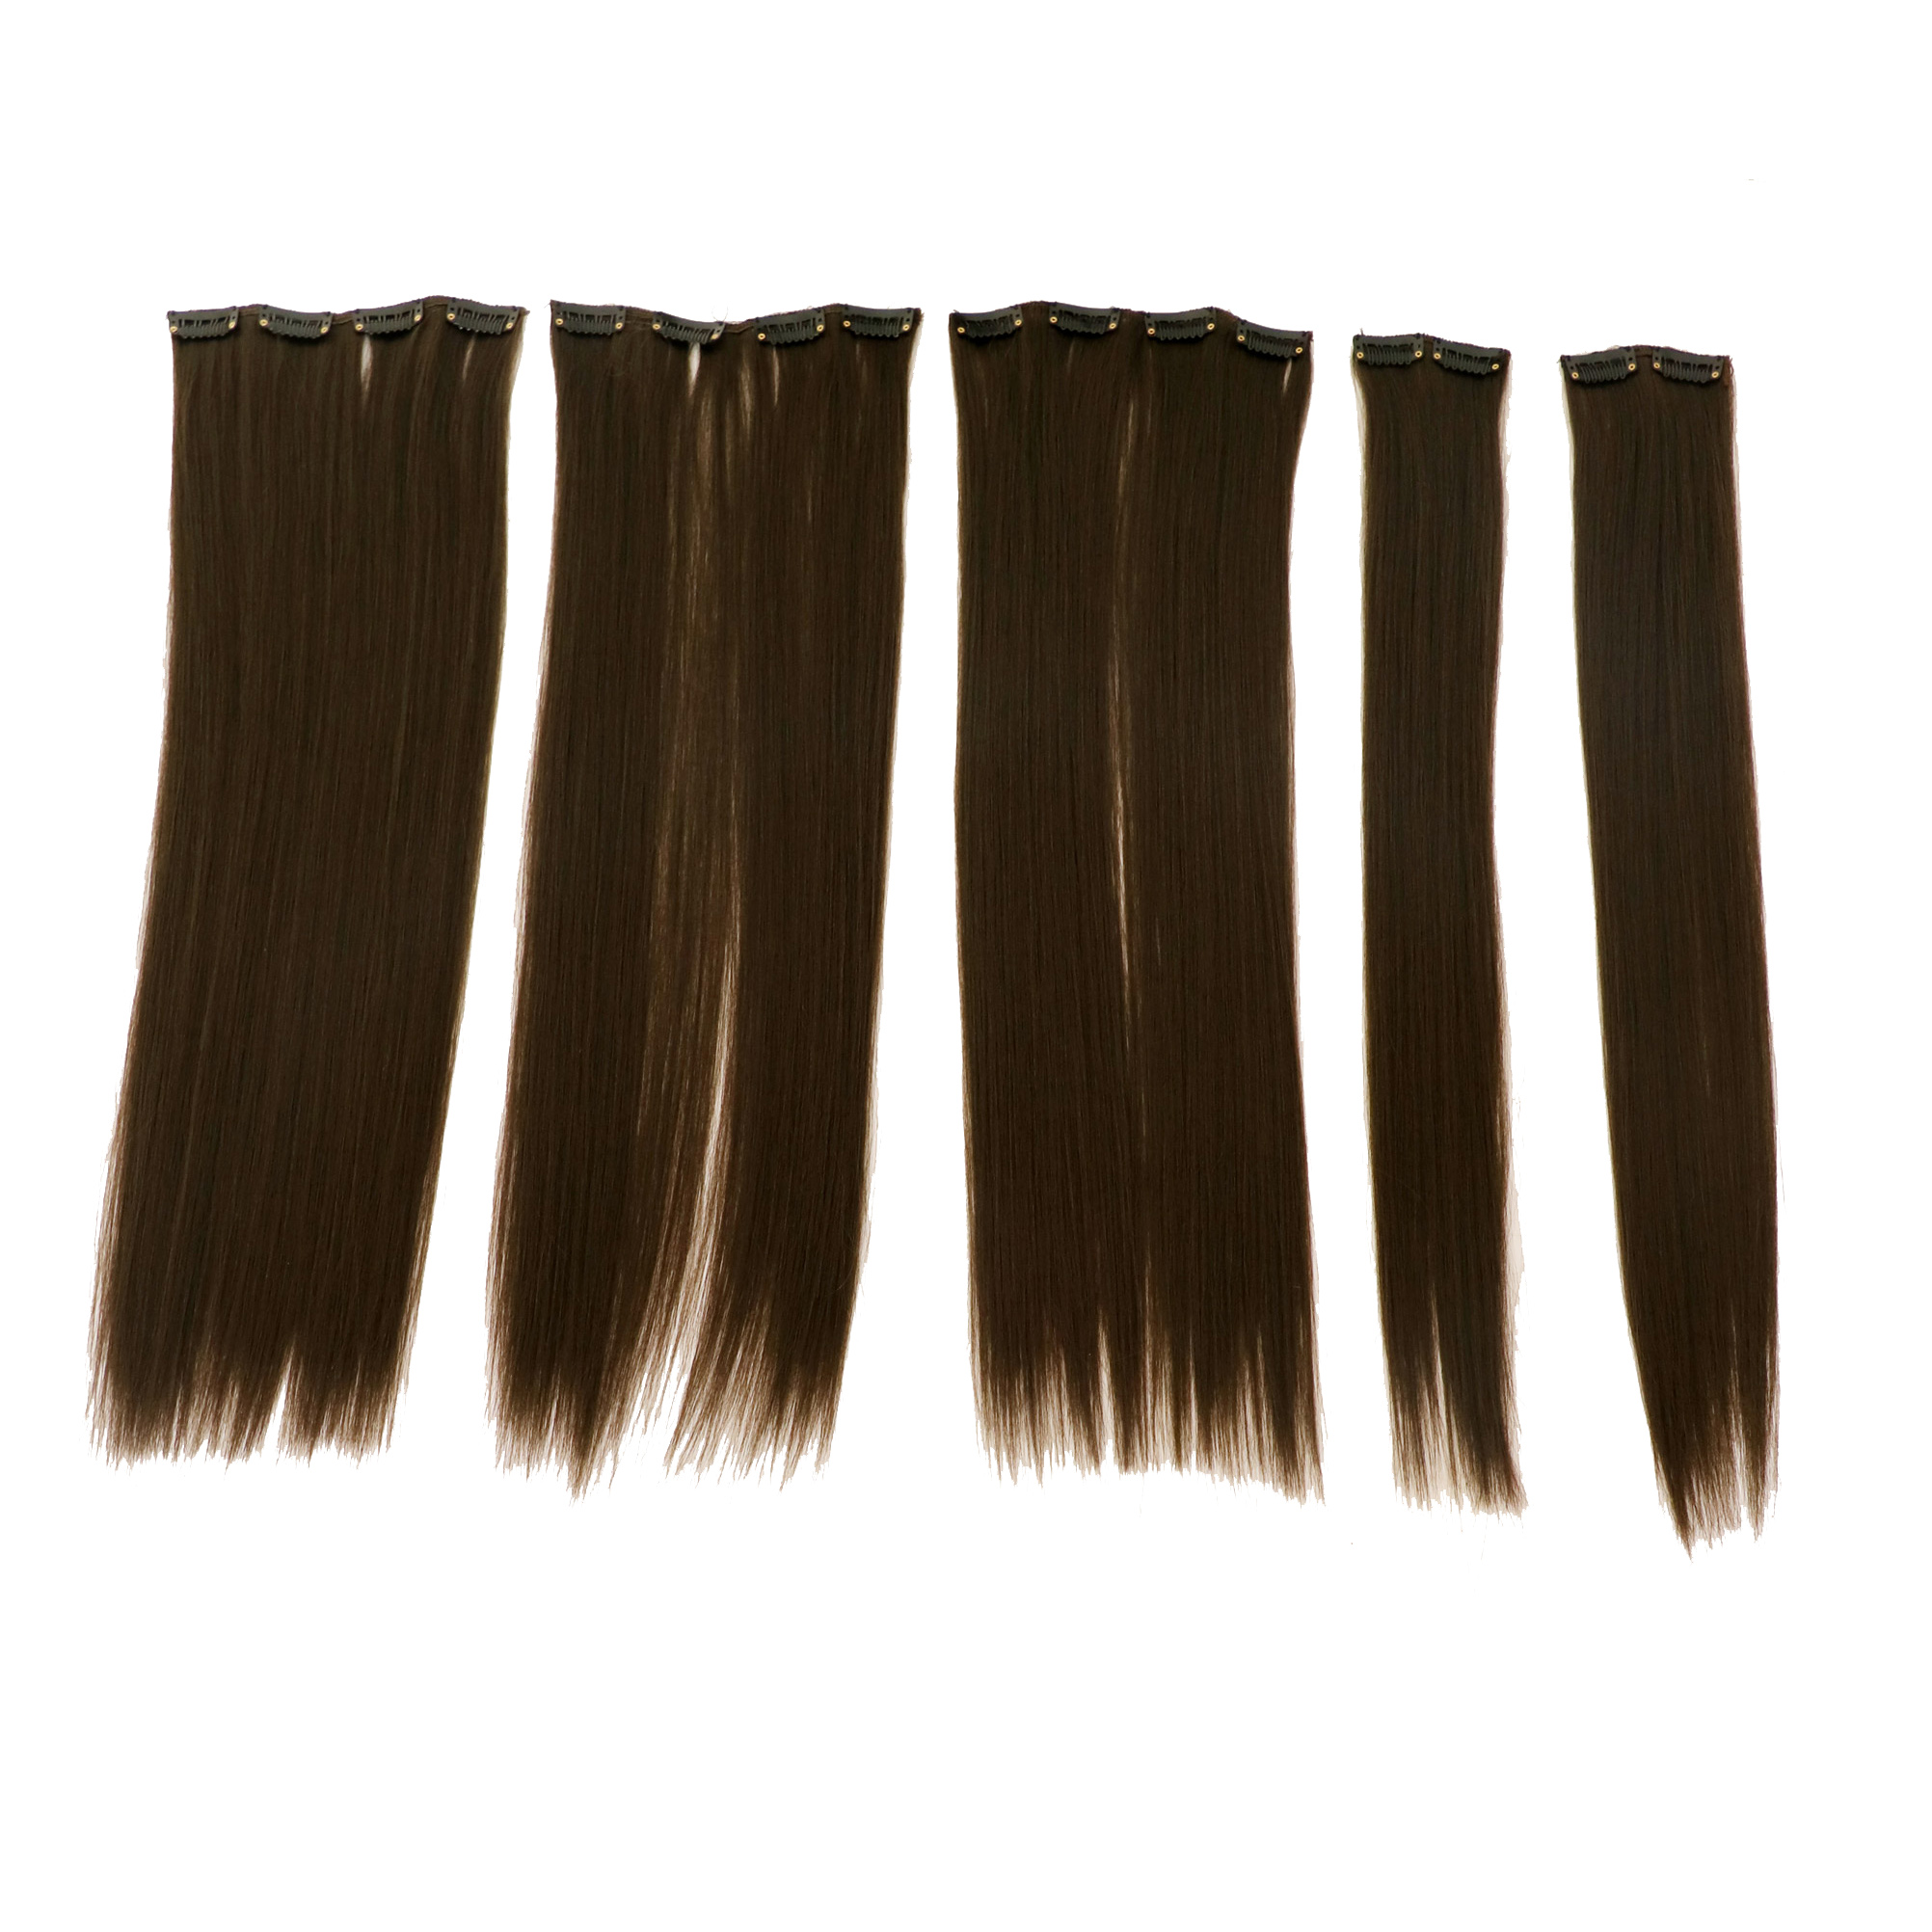 اکستنشن مو صاف اتو کشیده کد stw20c-4 رنگ موی طبیعی